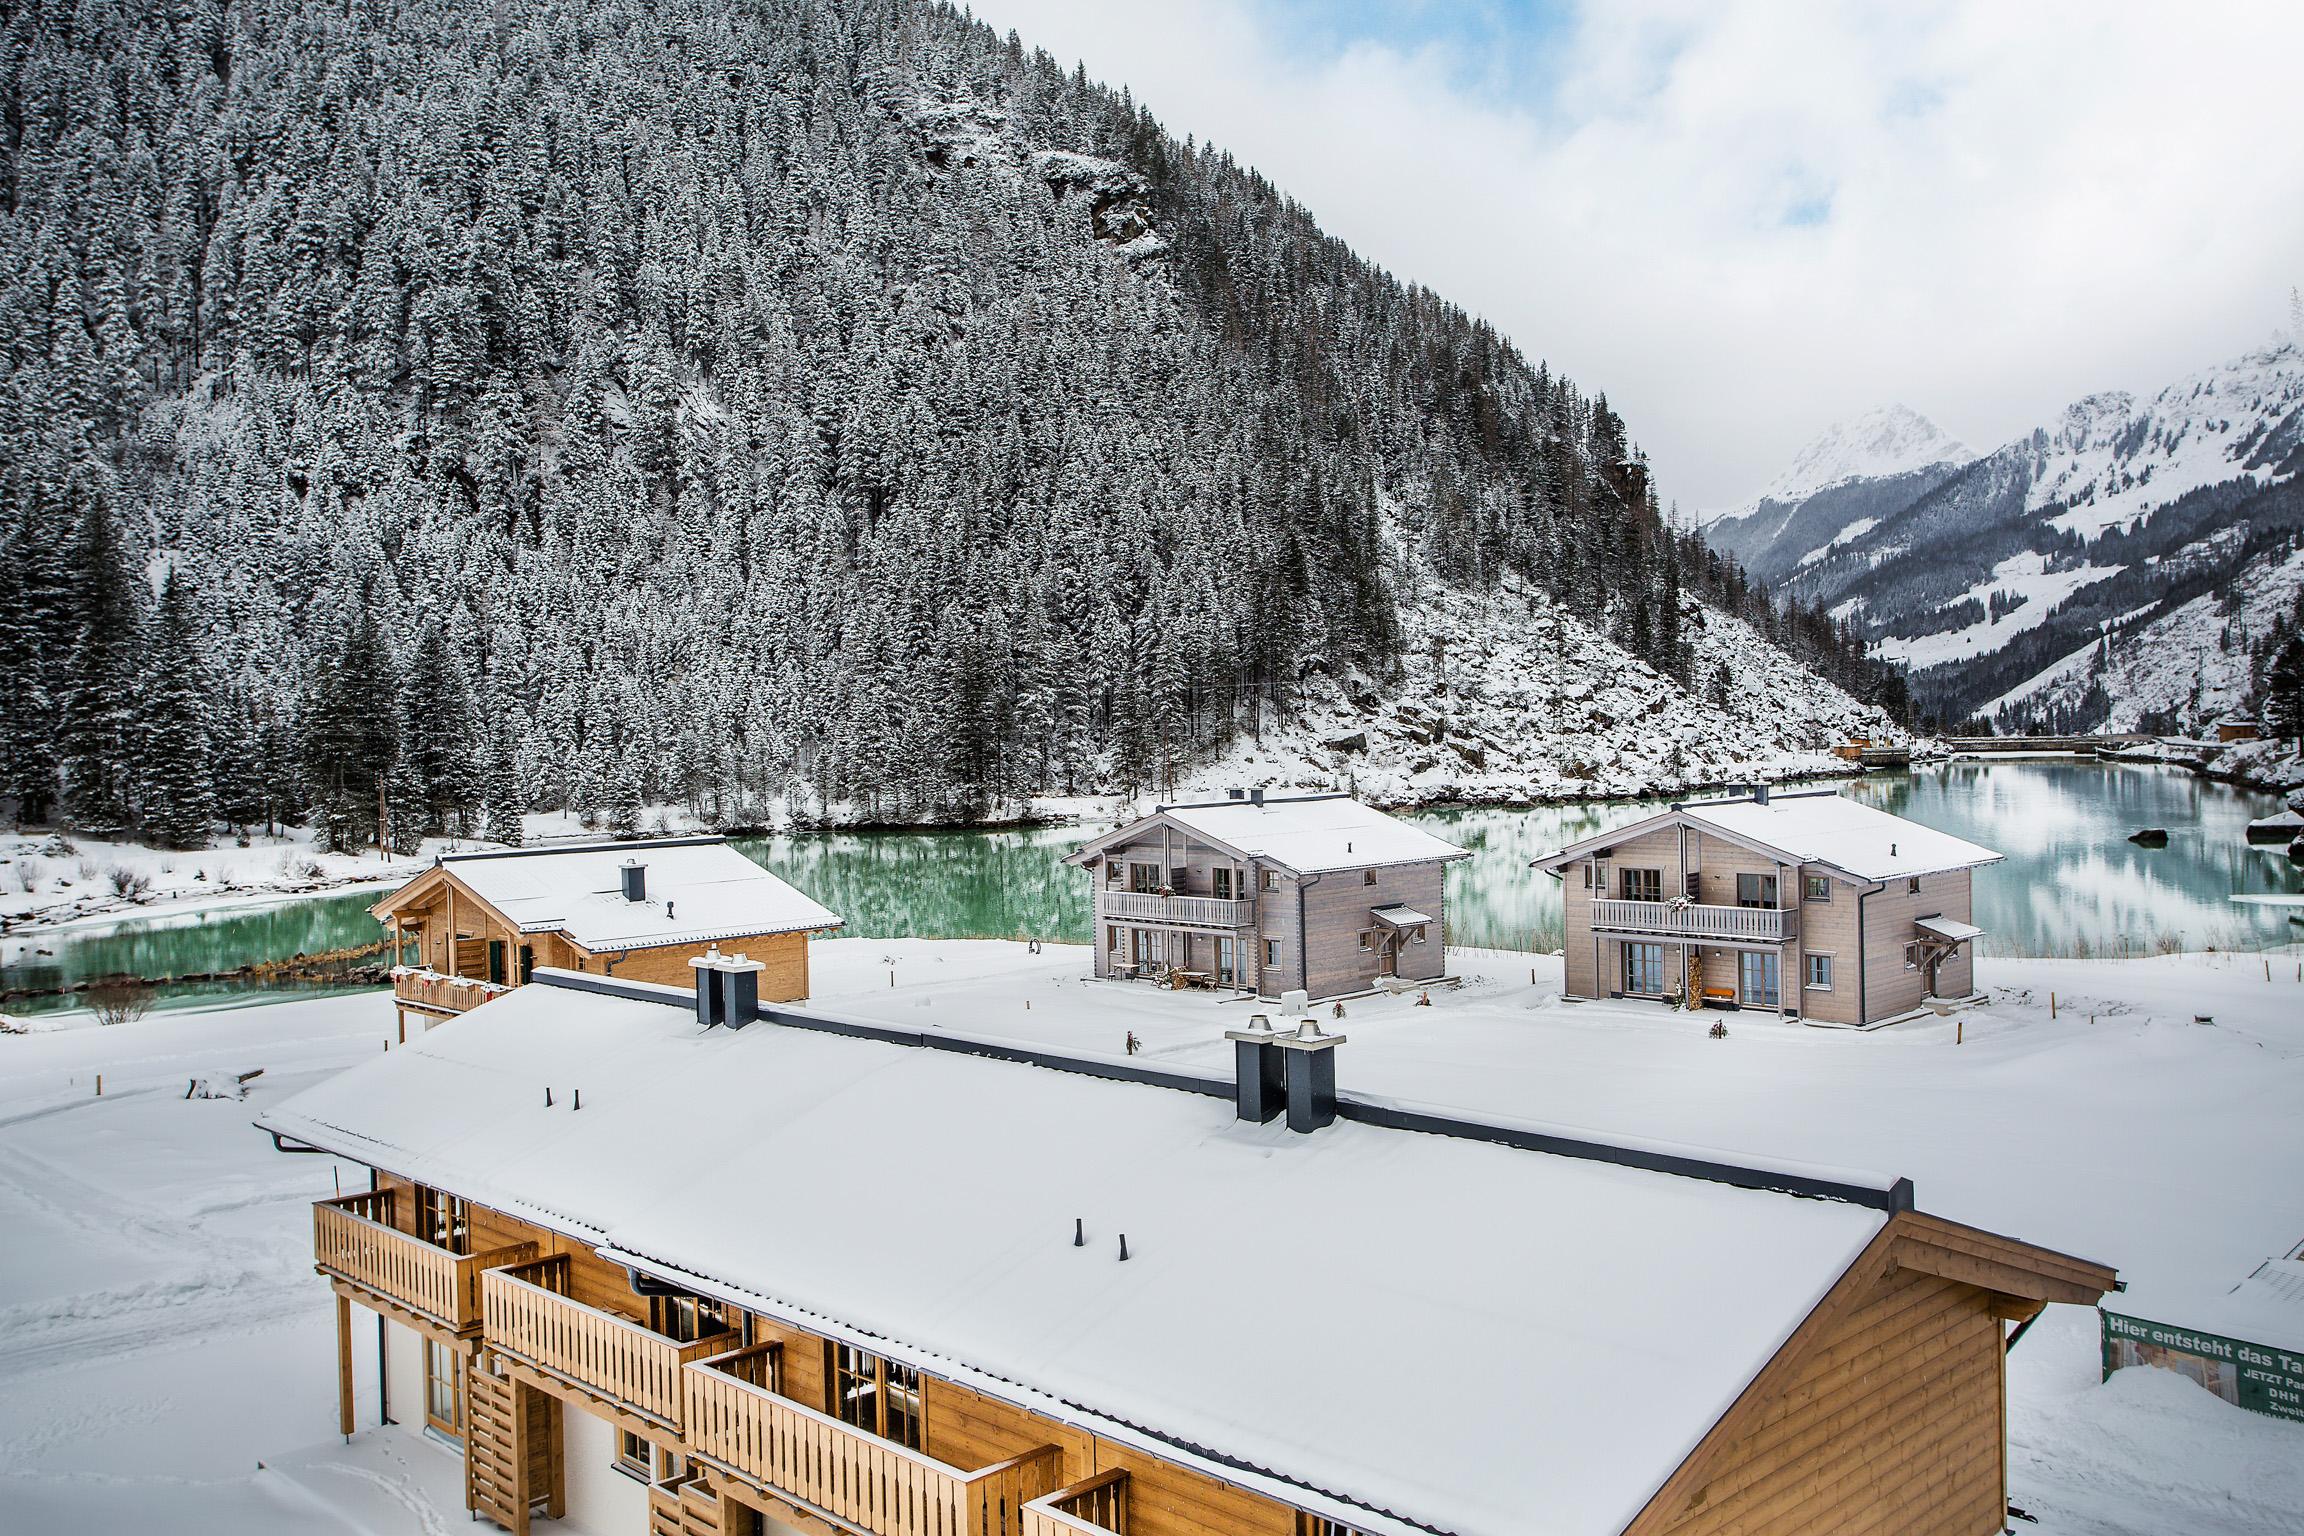 Maison de vacances Lodge Kleiner Bär direkt am Skilift (2050394), Uttendorf, Pinzgau, Salzbourg, Autriche, image 23